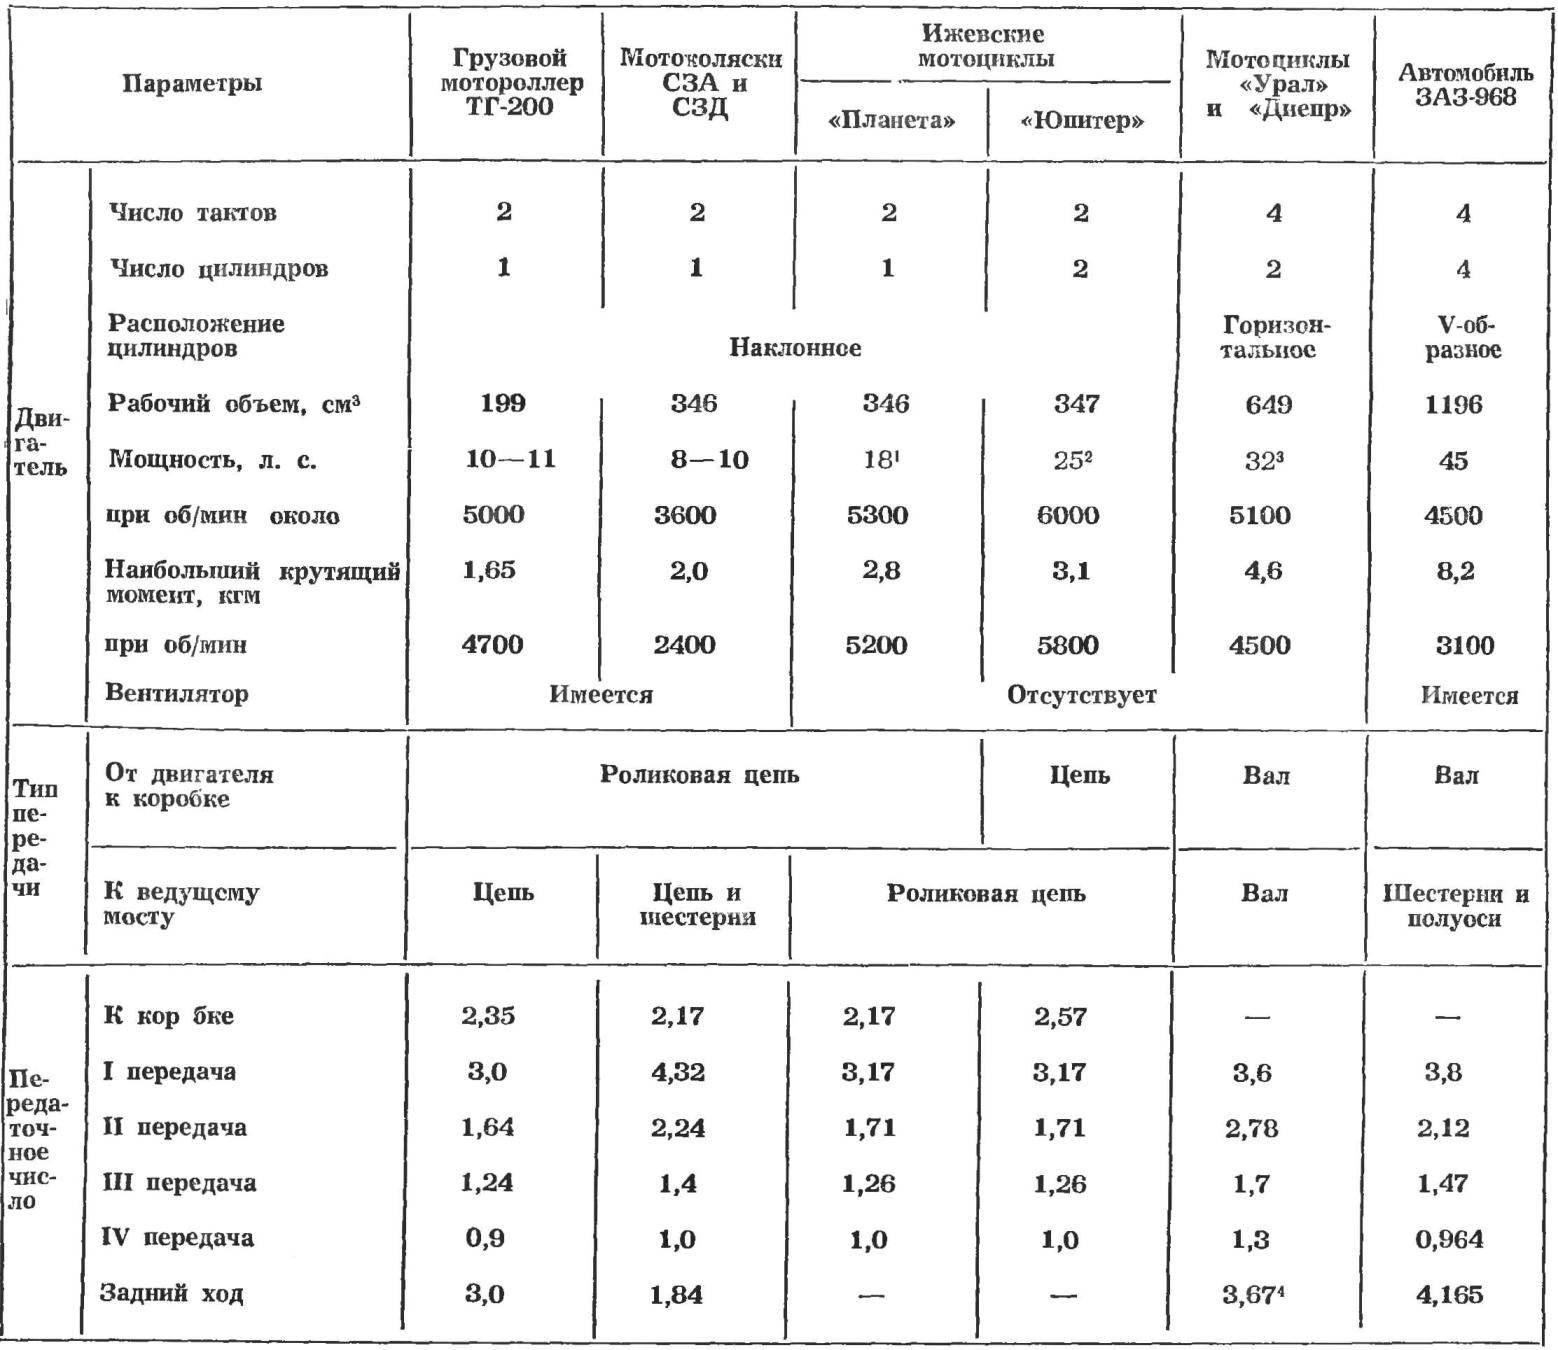 Table 1. DATA POWER UNIT